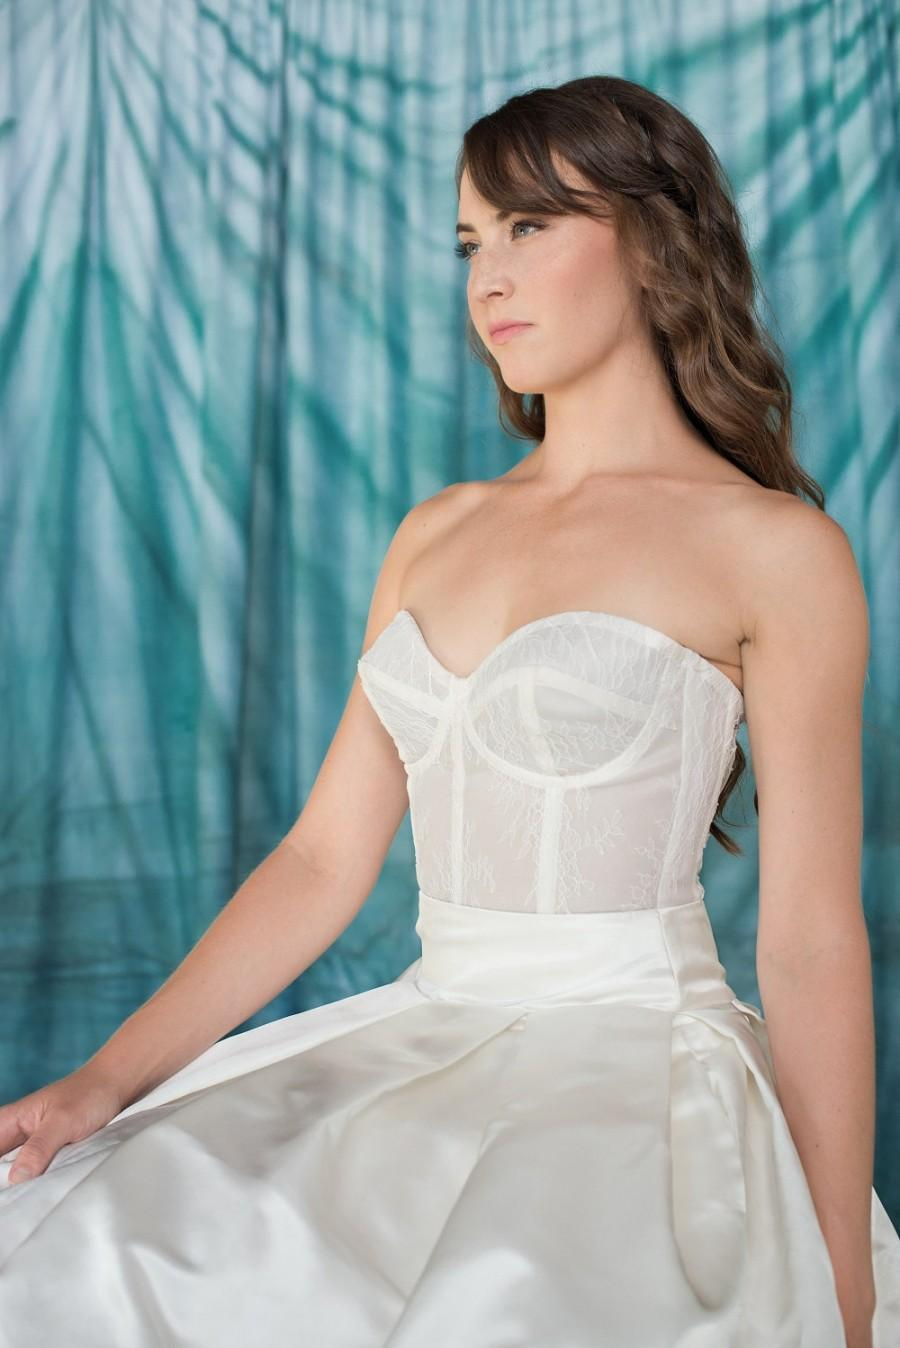 unique wedding dresses wedding dress corset top Two piece wedding dress buy corset top and skirt separate watterswtoo Ann Corset B